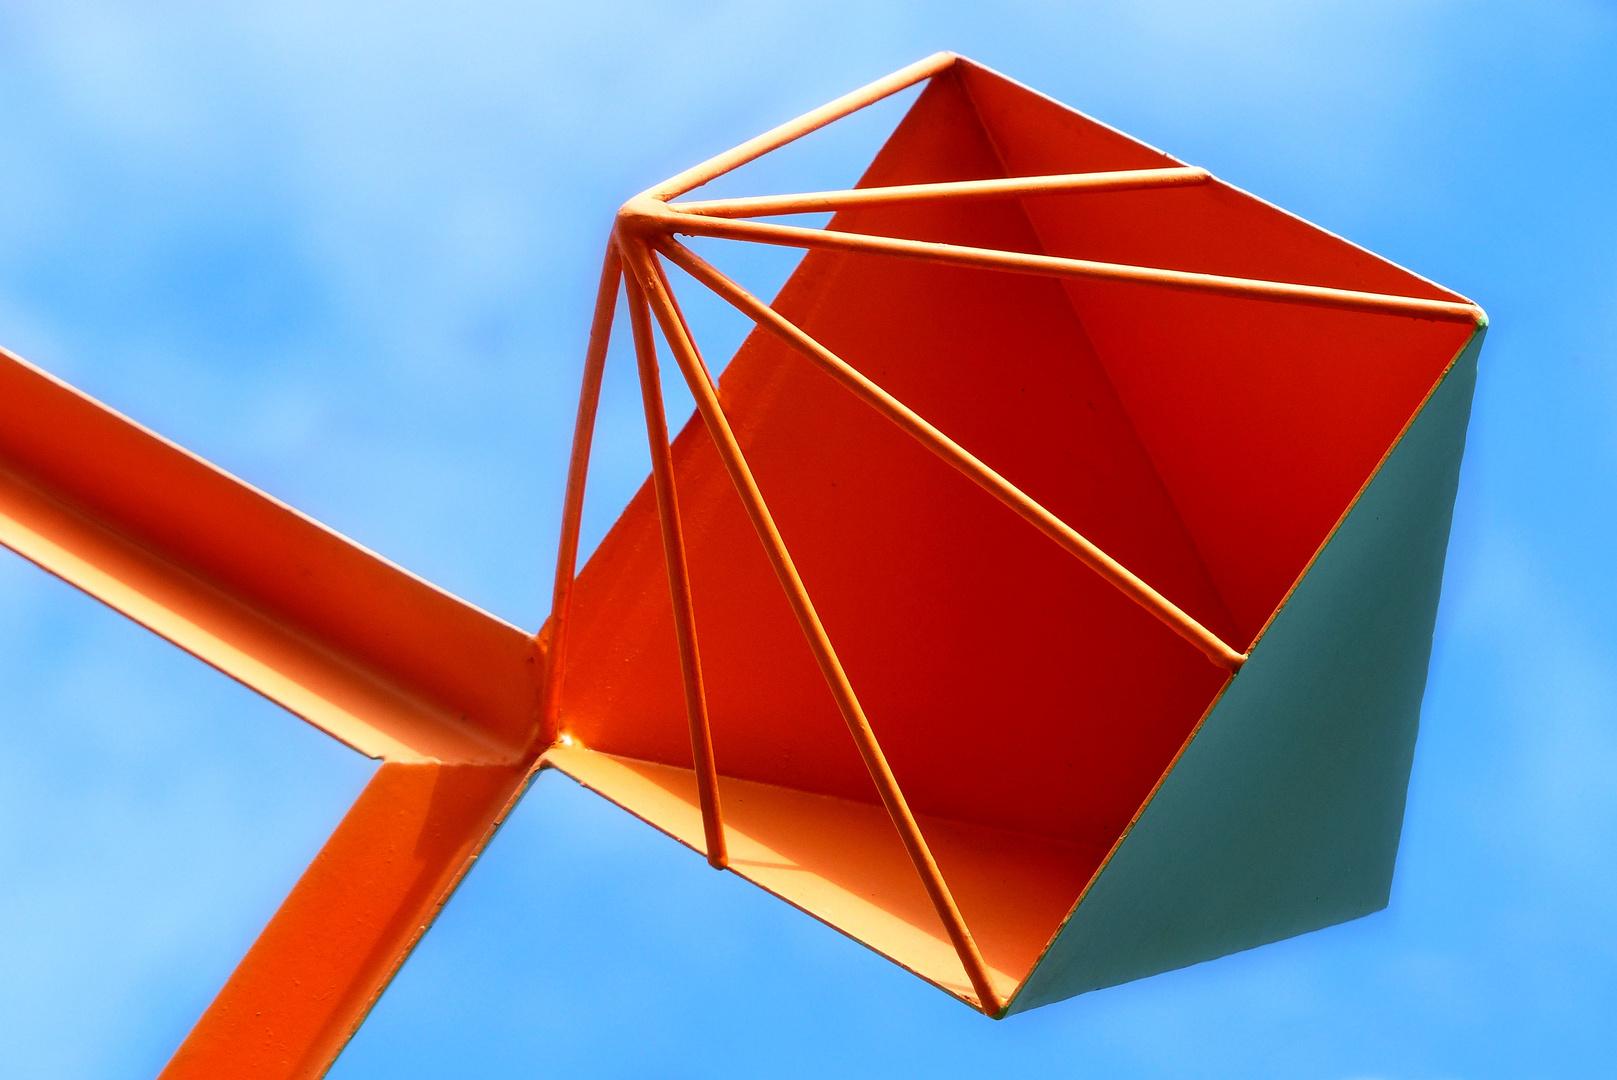 ... fragment of Wind sculpture Manrique